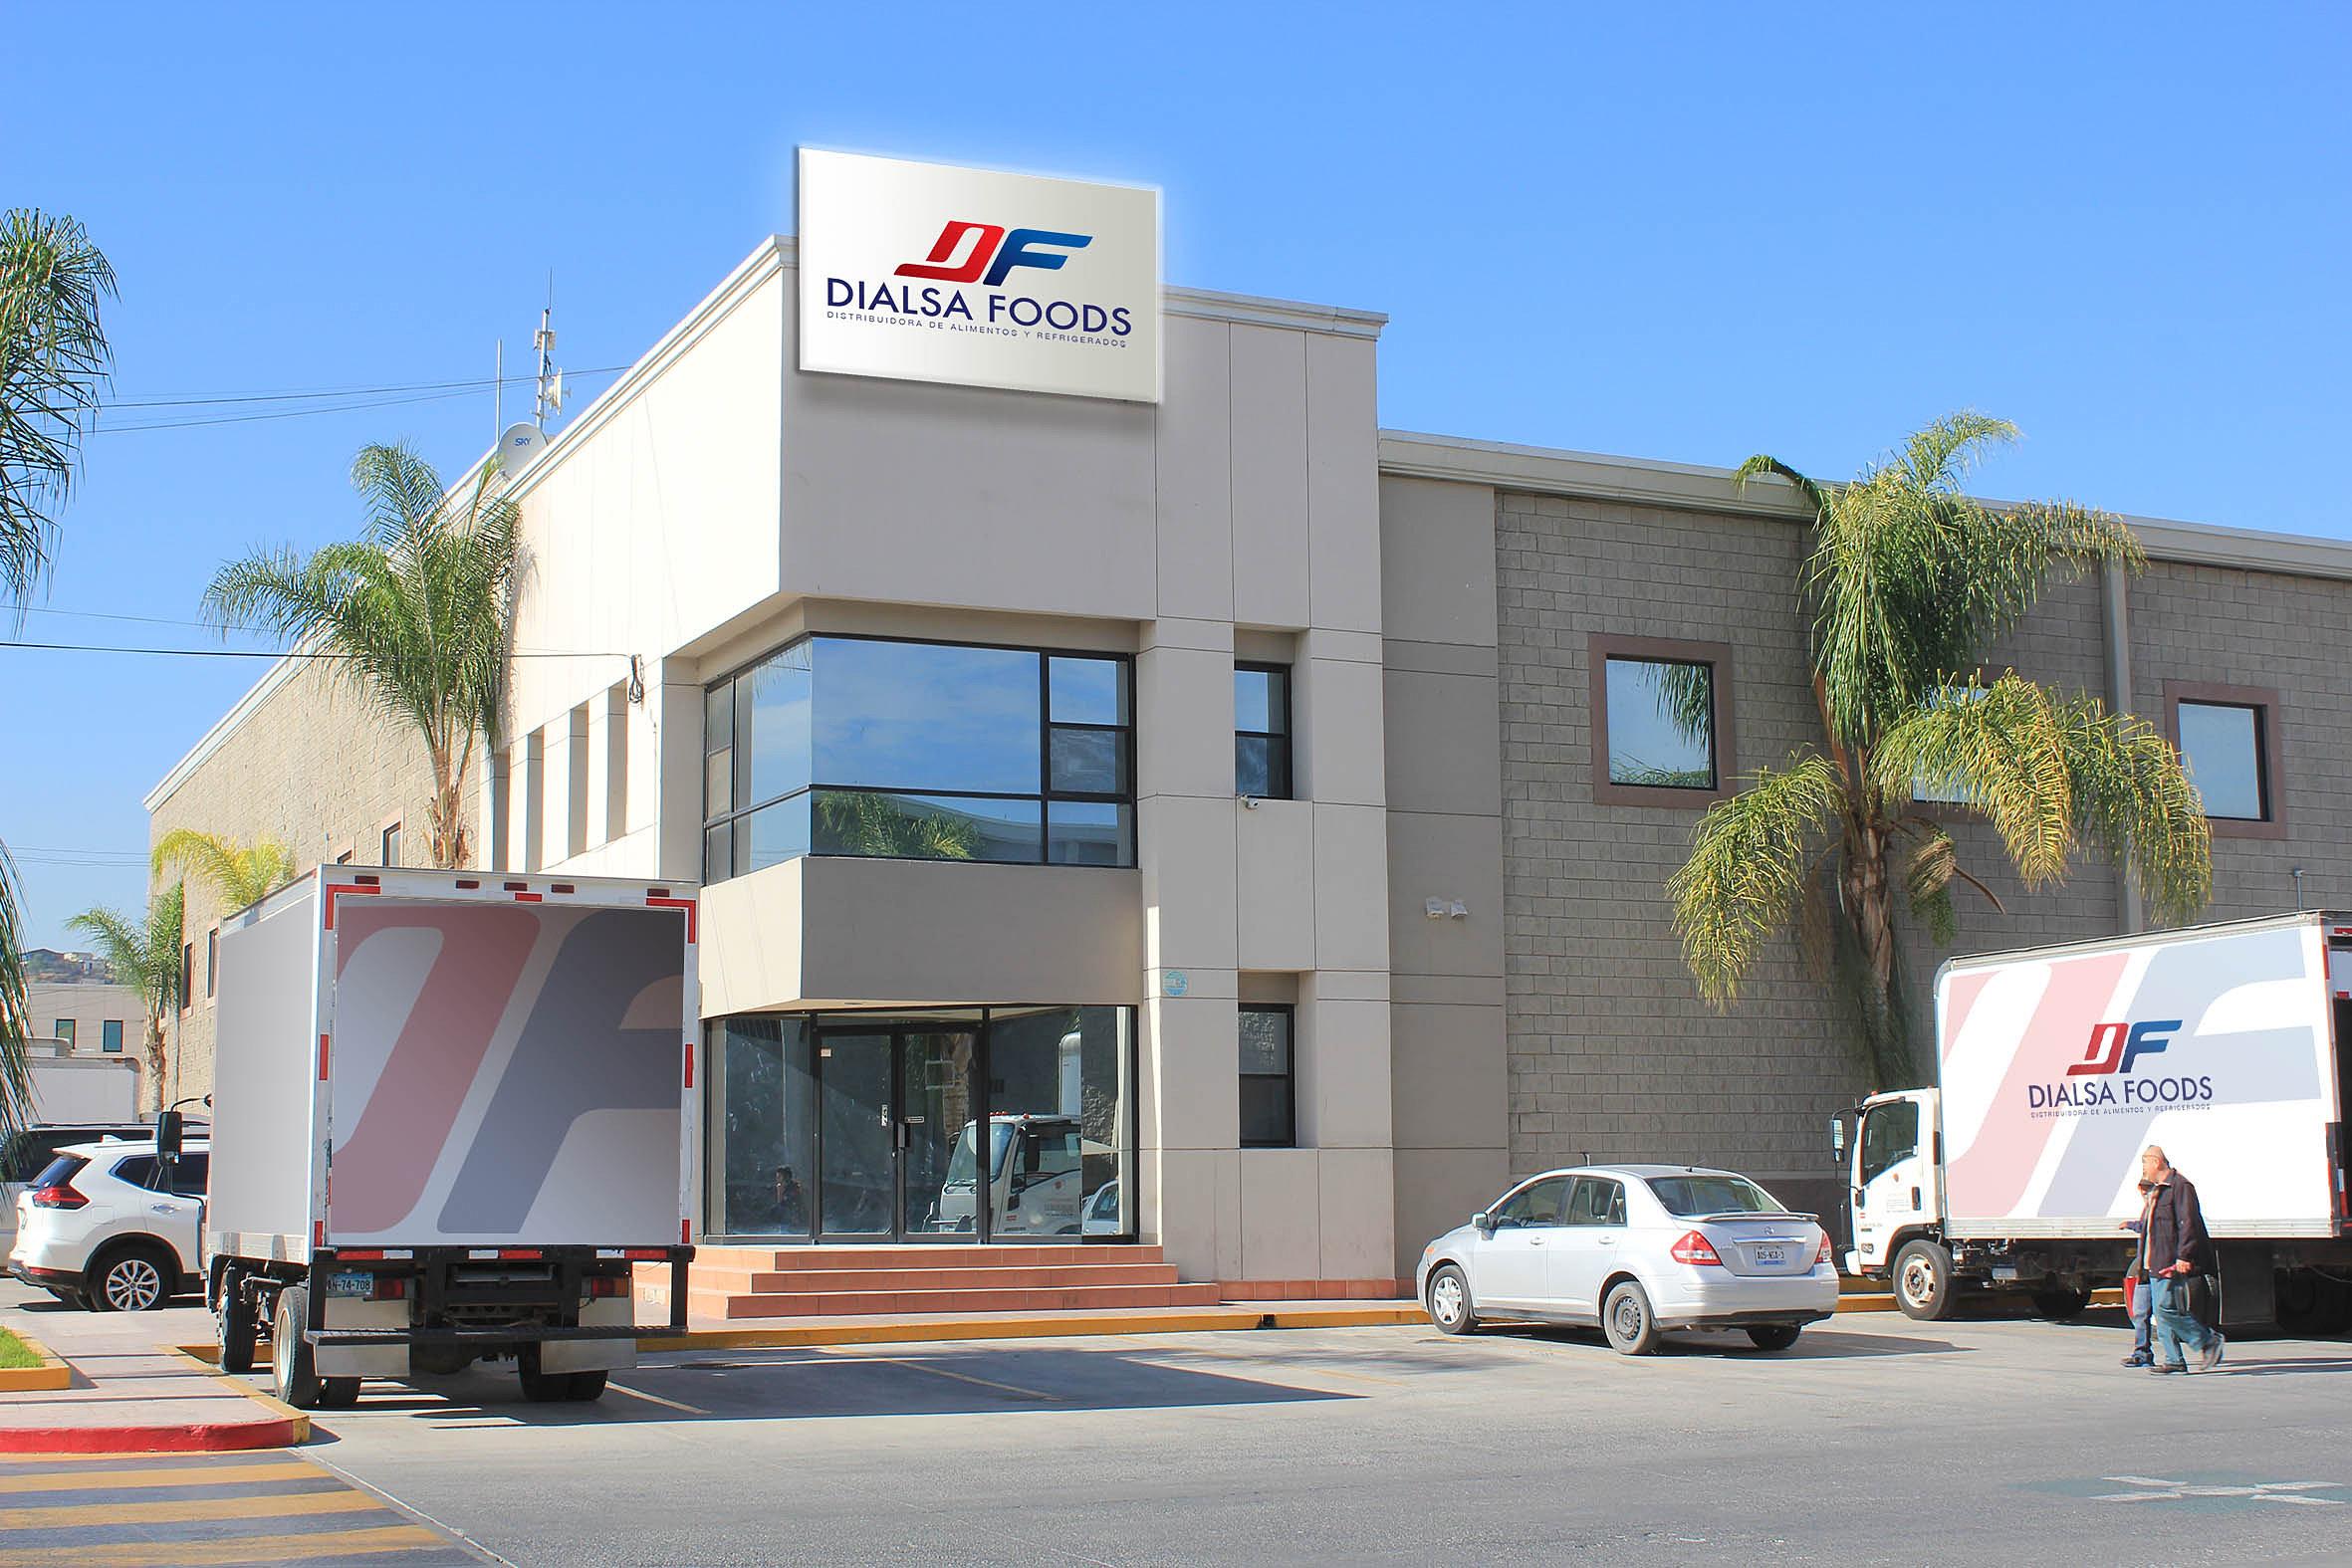 Distribuidora De Alimentos Dialsa Foods Tijuana